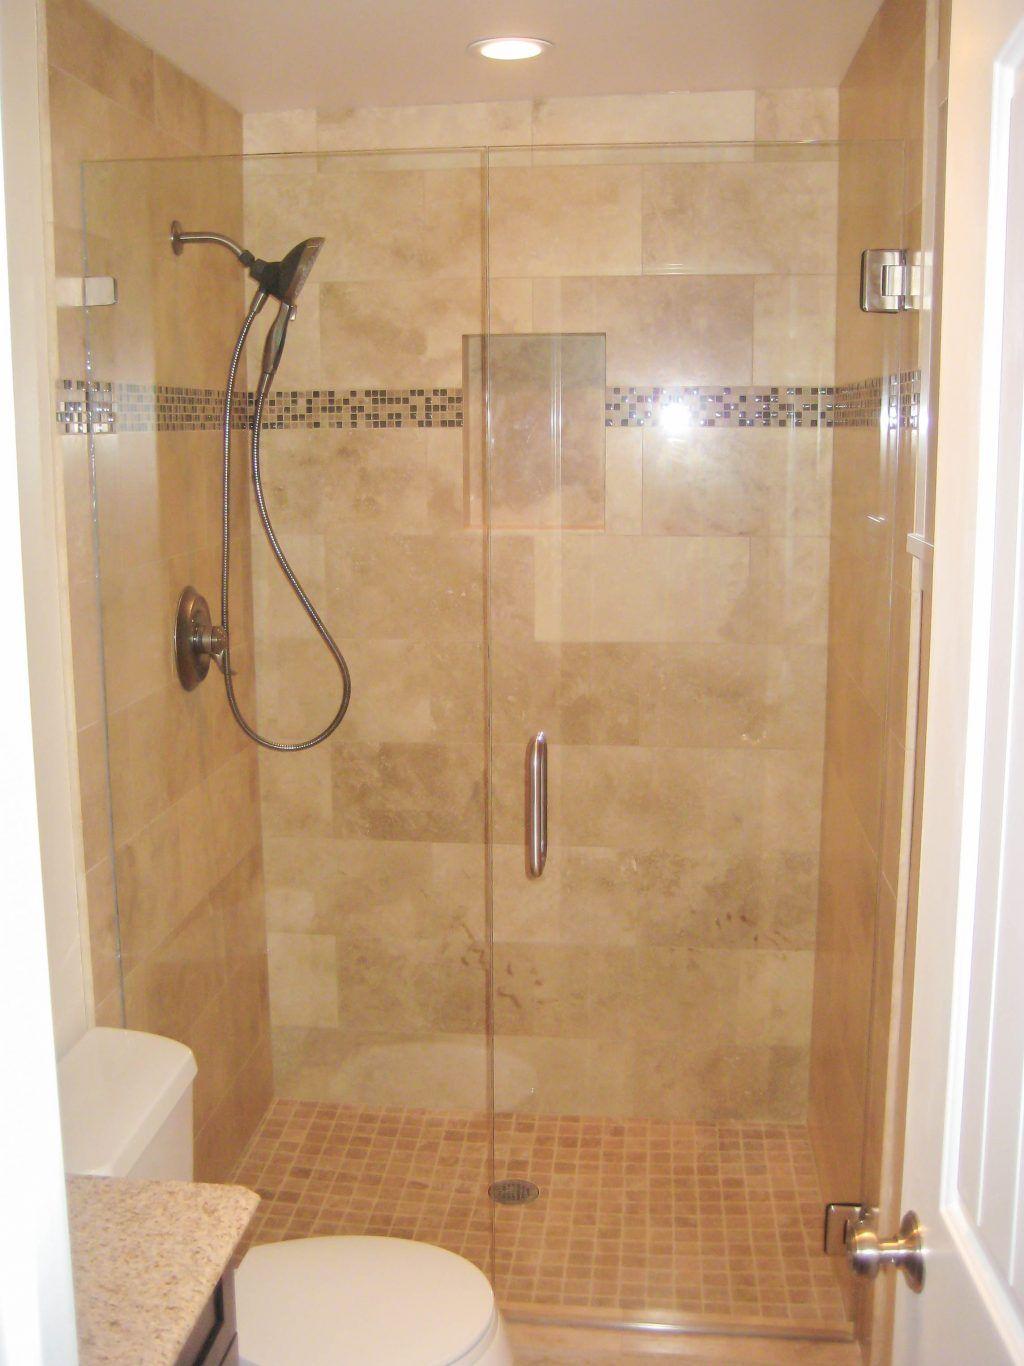 Image result for narrow shower room ideas | Bathroom | Pinterest ...